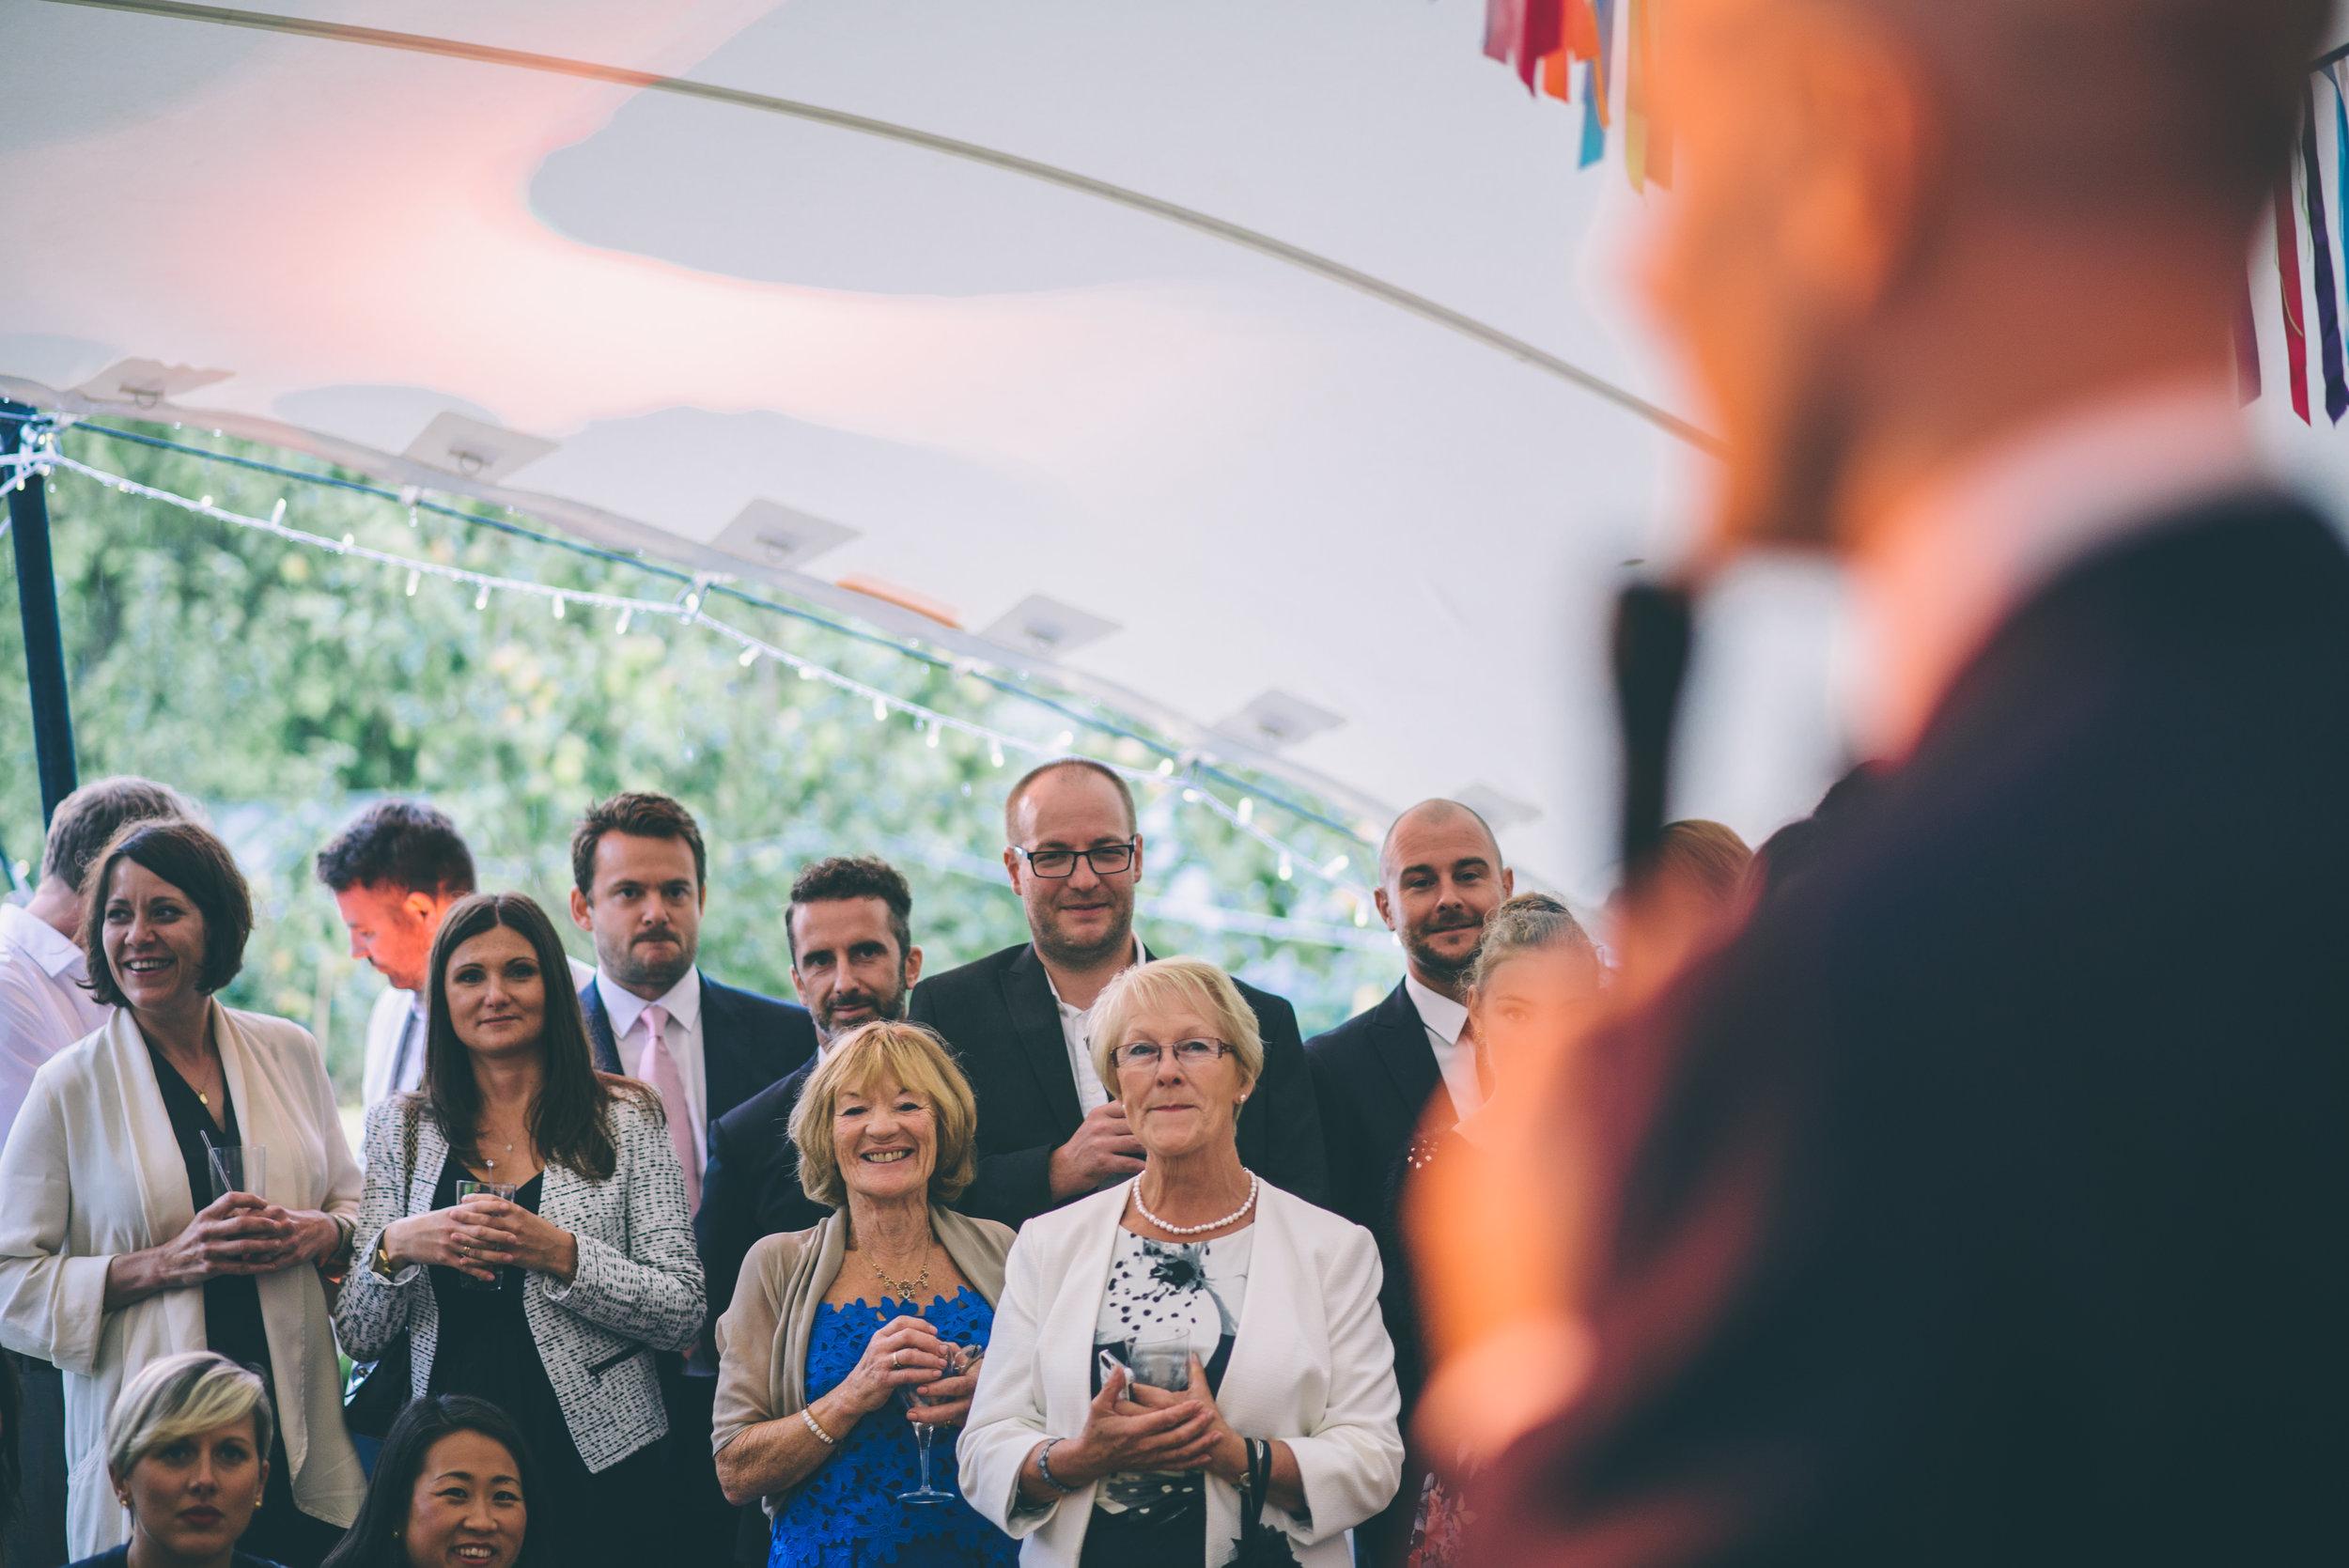 Garden Wedding photography Barley Herefordshire - Tracy + Matt -422.jpg